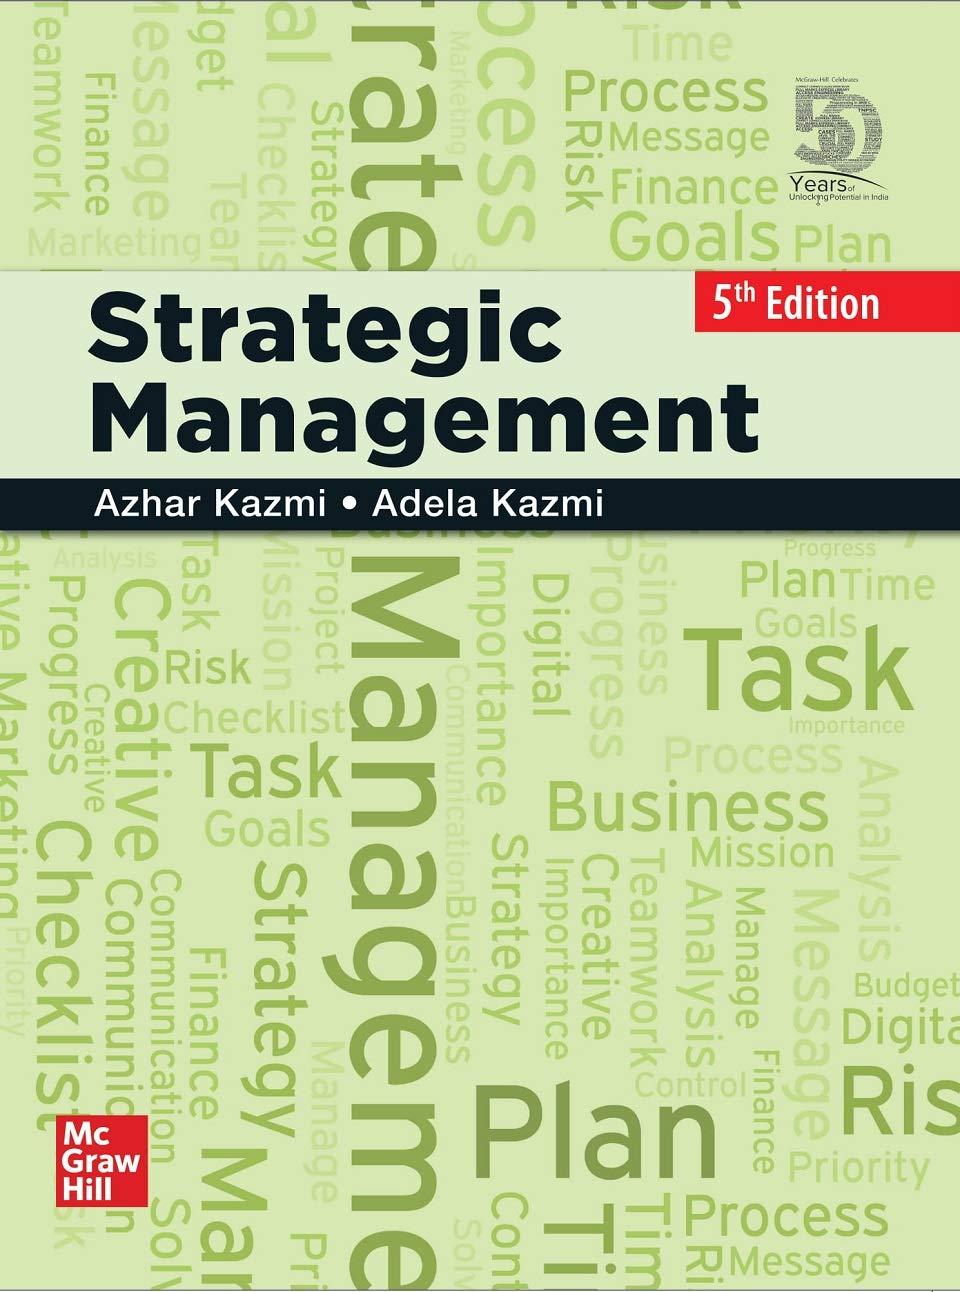 Strategic Management | Fifth Edition